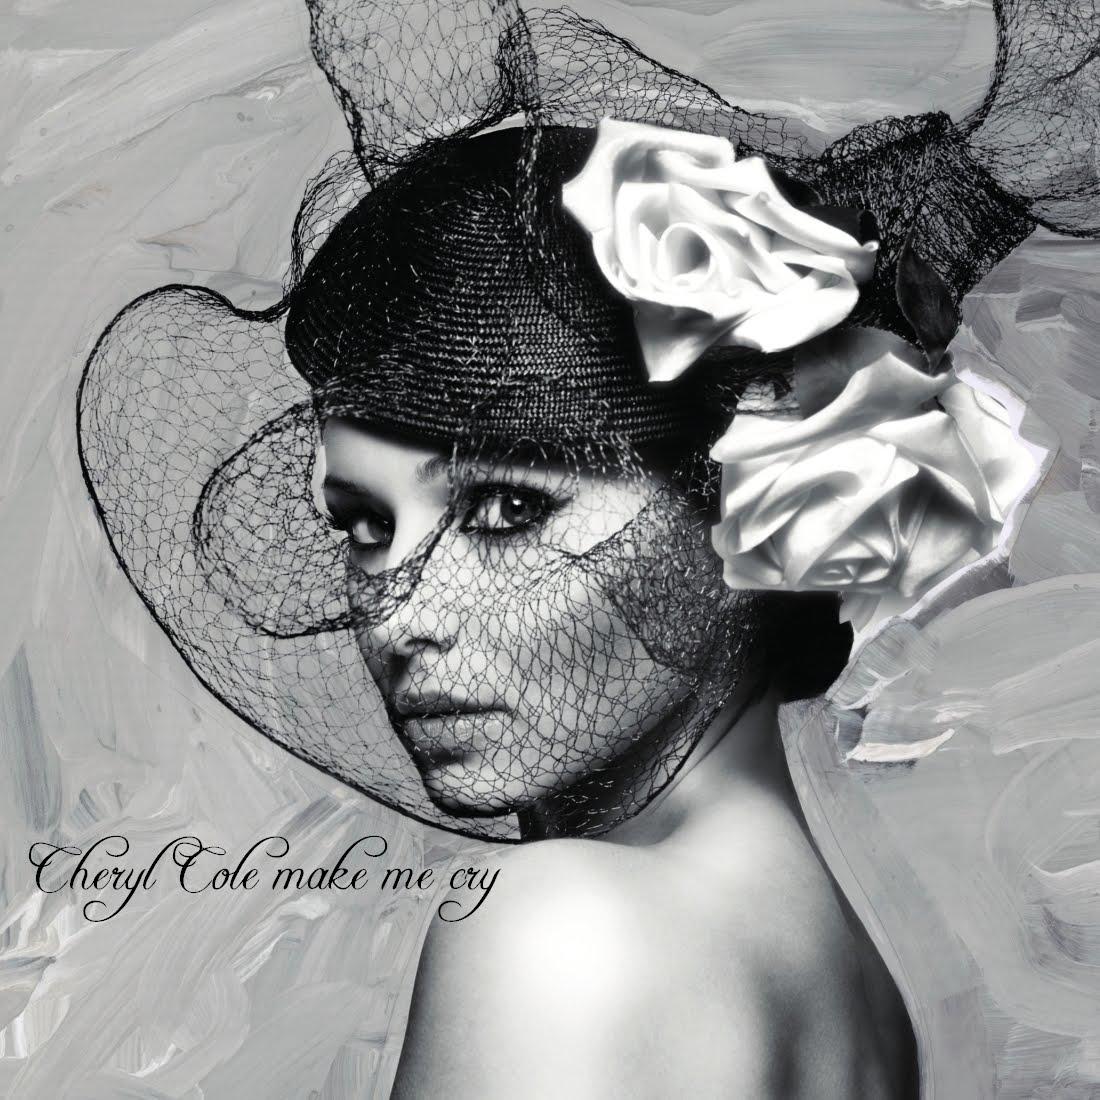 http://1.bp.blogspot.com/_6lV5hzNR1fU/TCkWKvSDA2I/AAAAAAAAIoI/X_m1PTRi3JI/s1600/Cheryl-Cole-Make-Me-Cry-FanMade.jpg